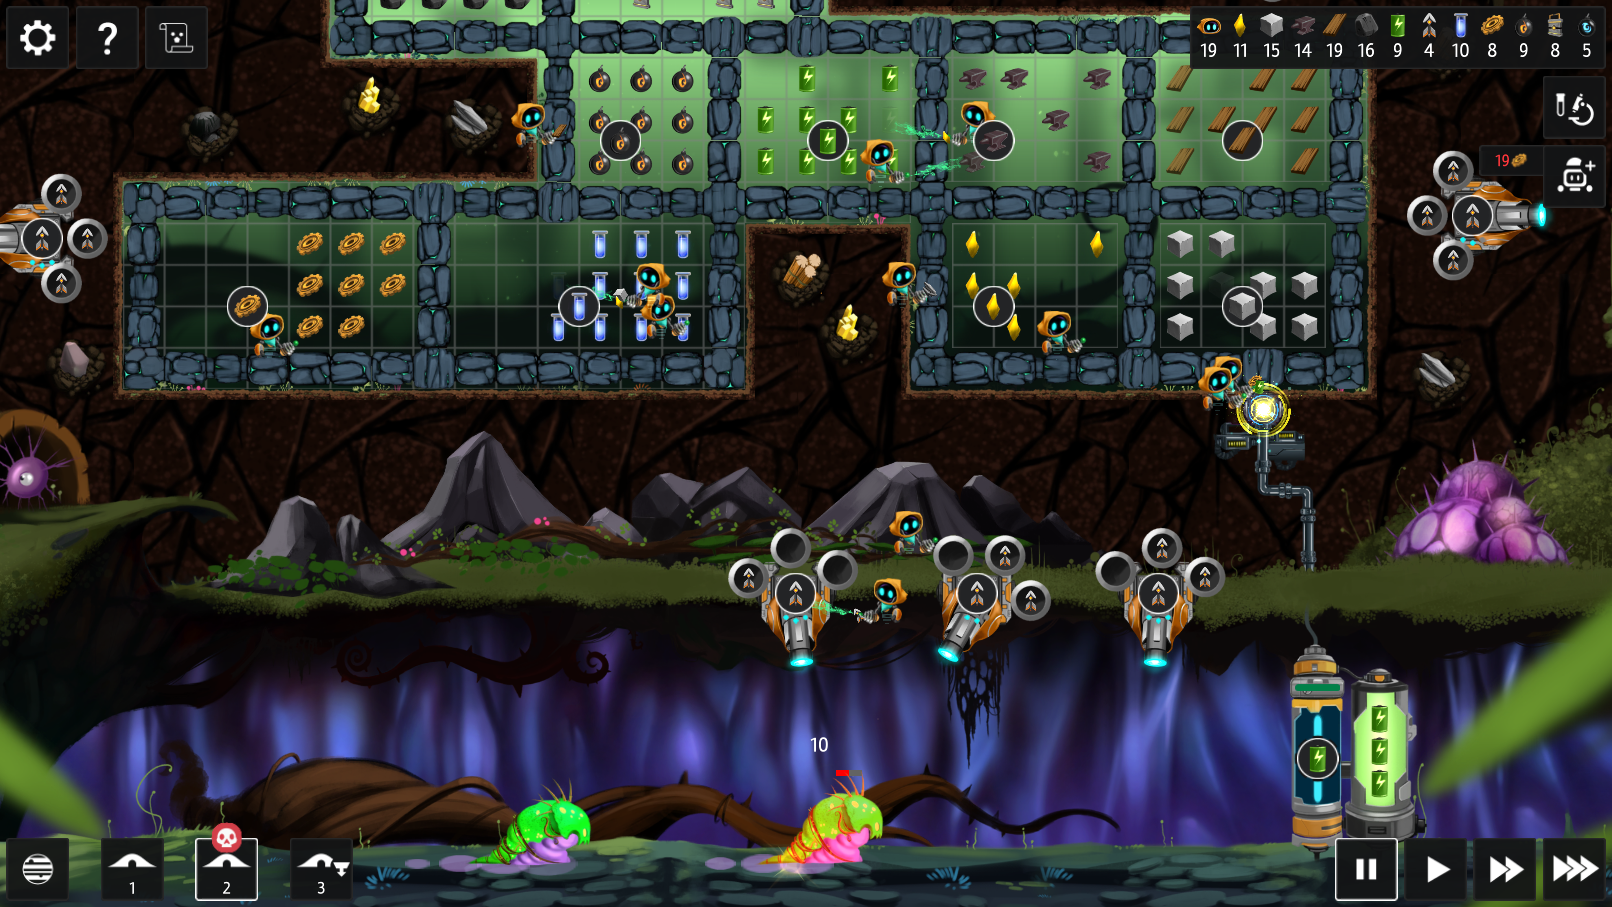 Screenshot from the video game Illuminaria